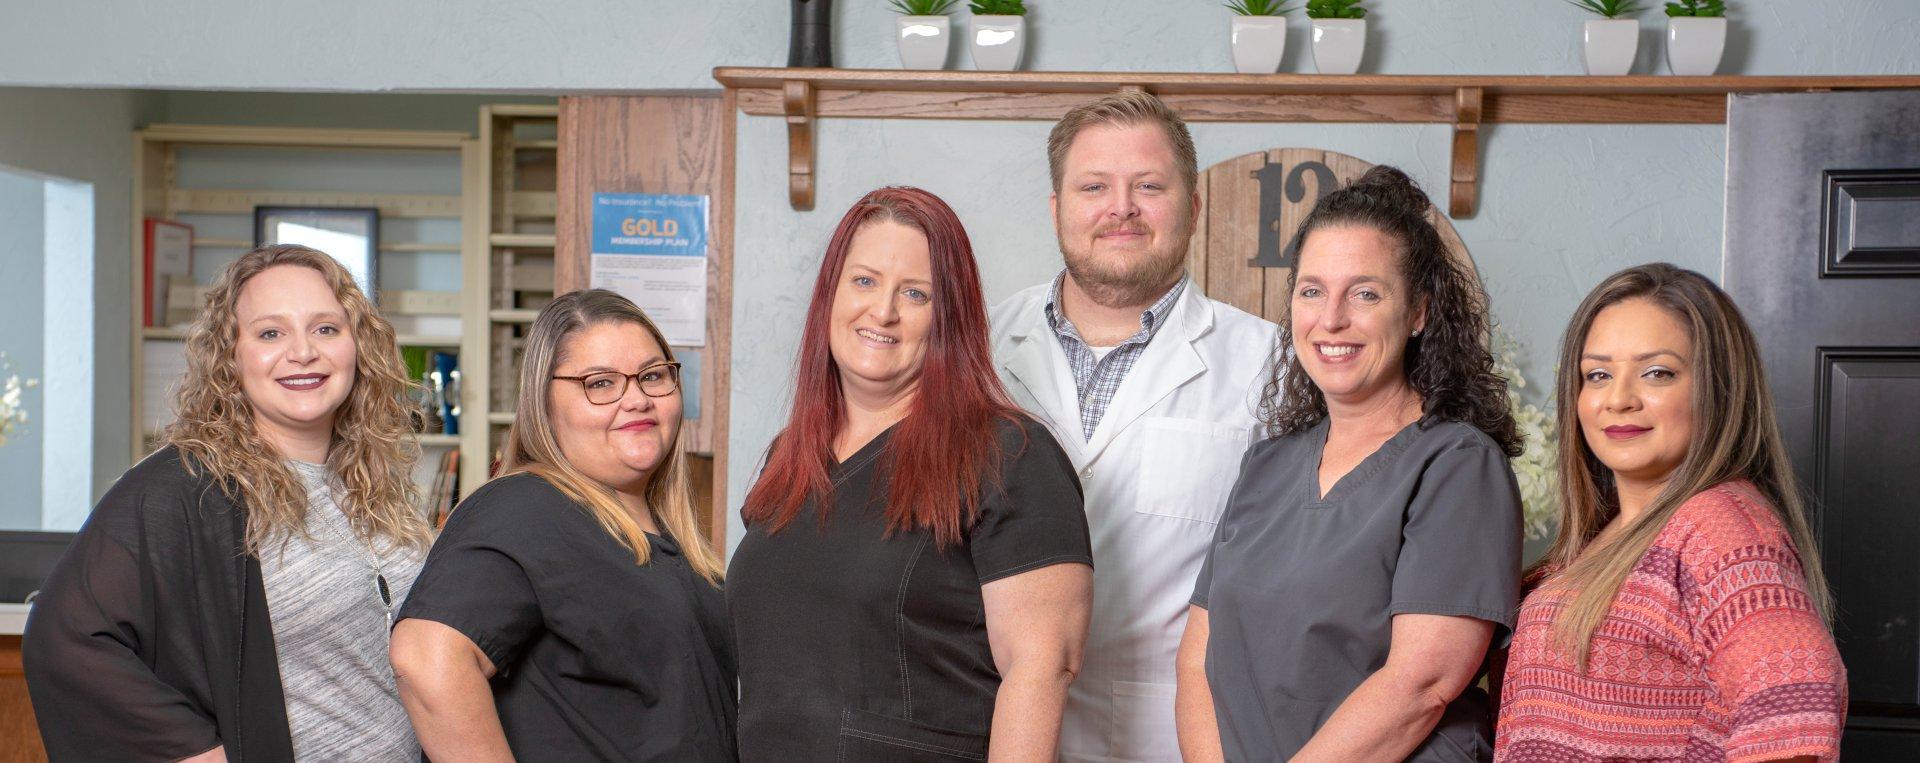 Summer Dental OKC Team